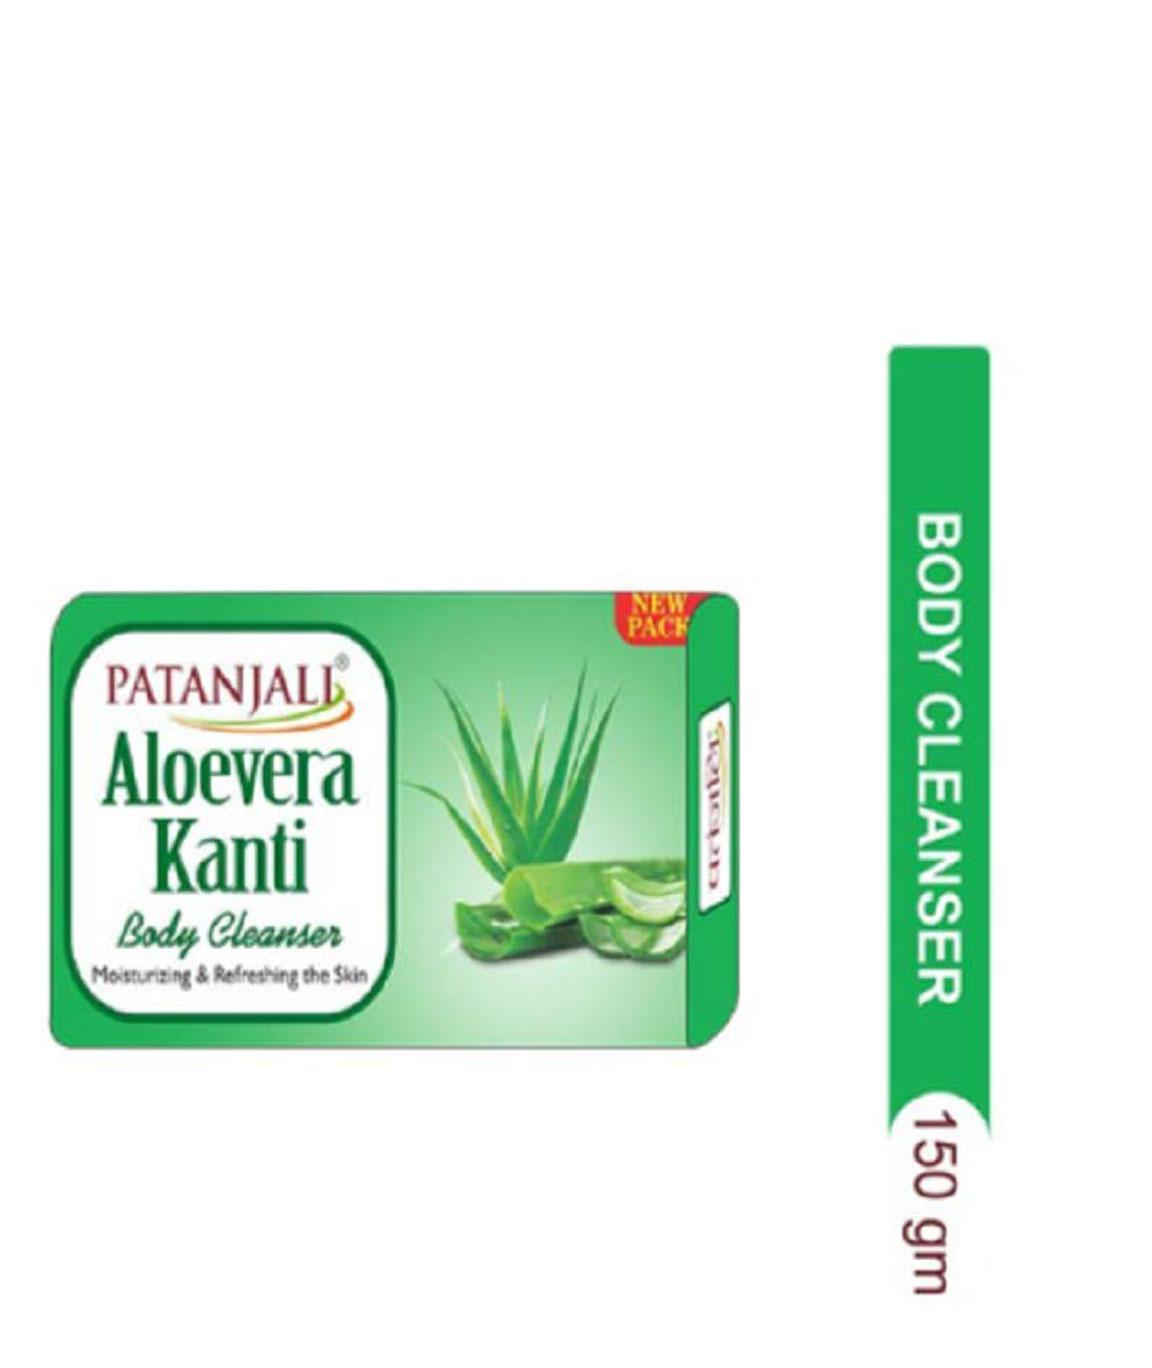 Patanjali Aloevera Kanti Body Cleanser Soap 57gm - Pack of 4